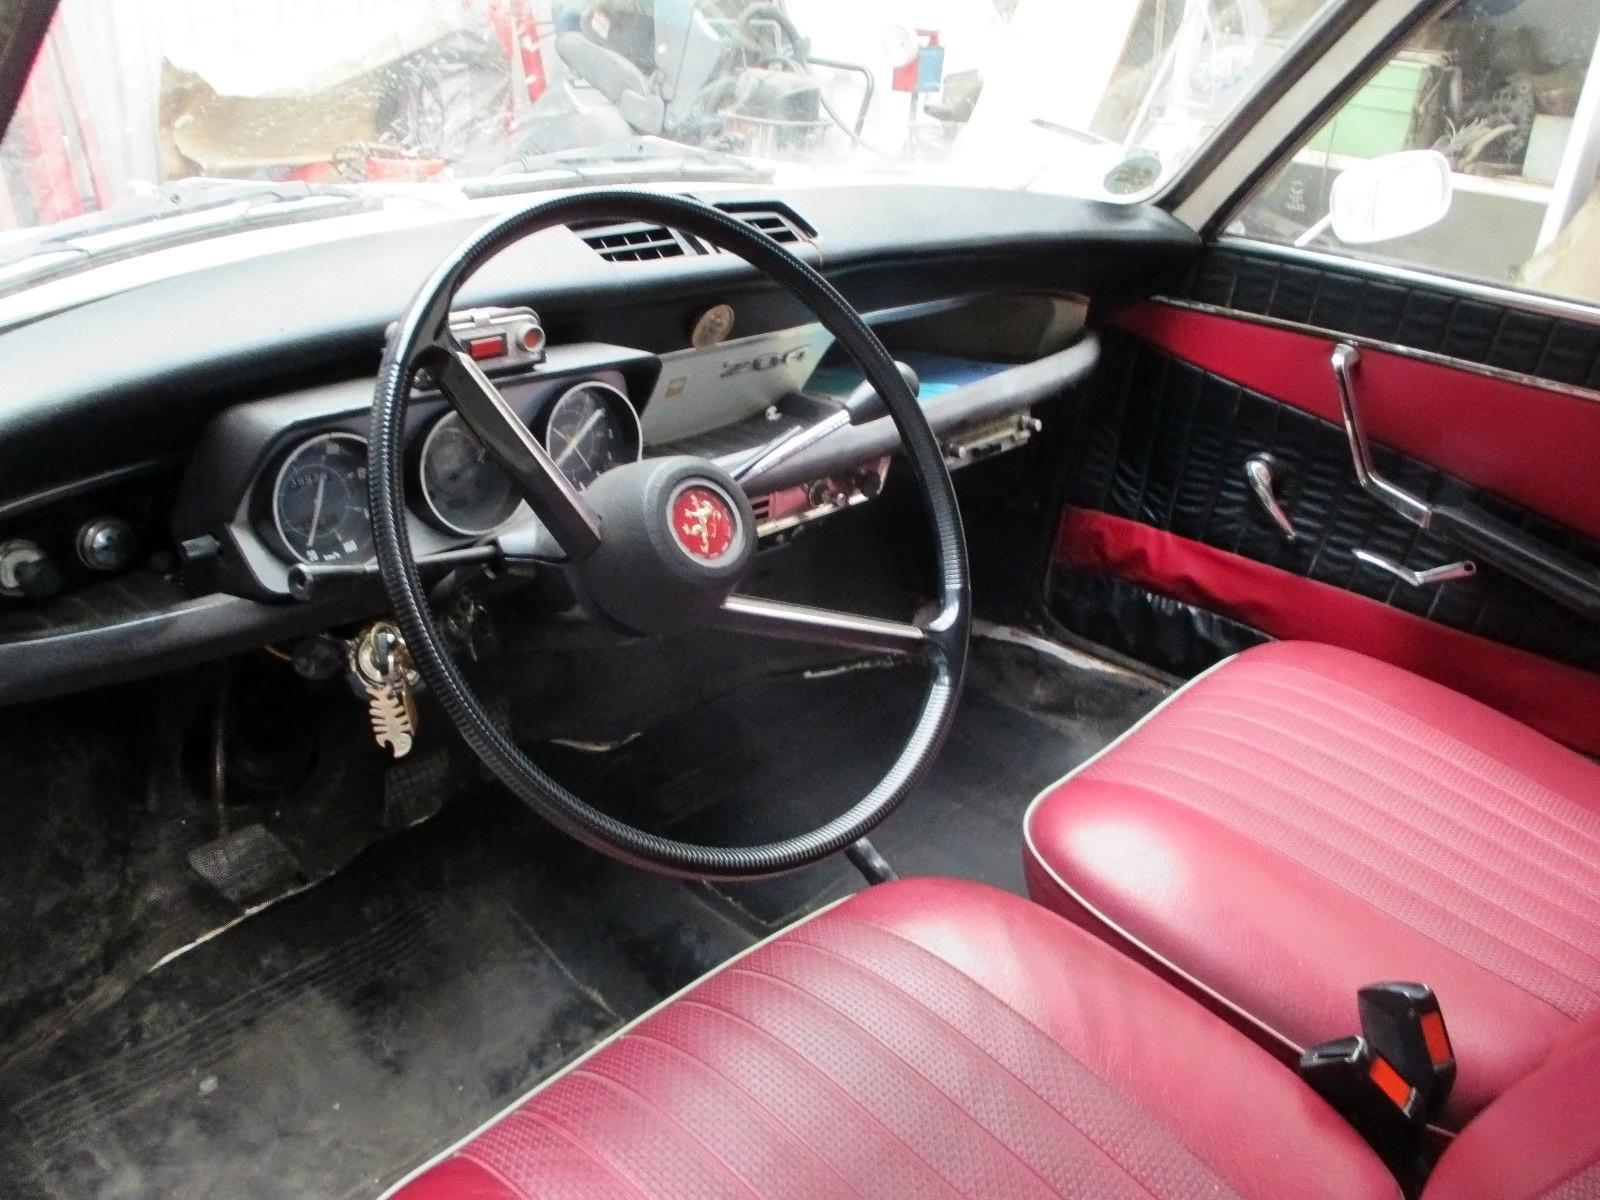 French Diesel 1968 Peugeot 204 Estate